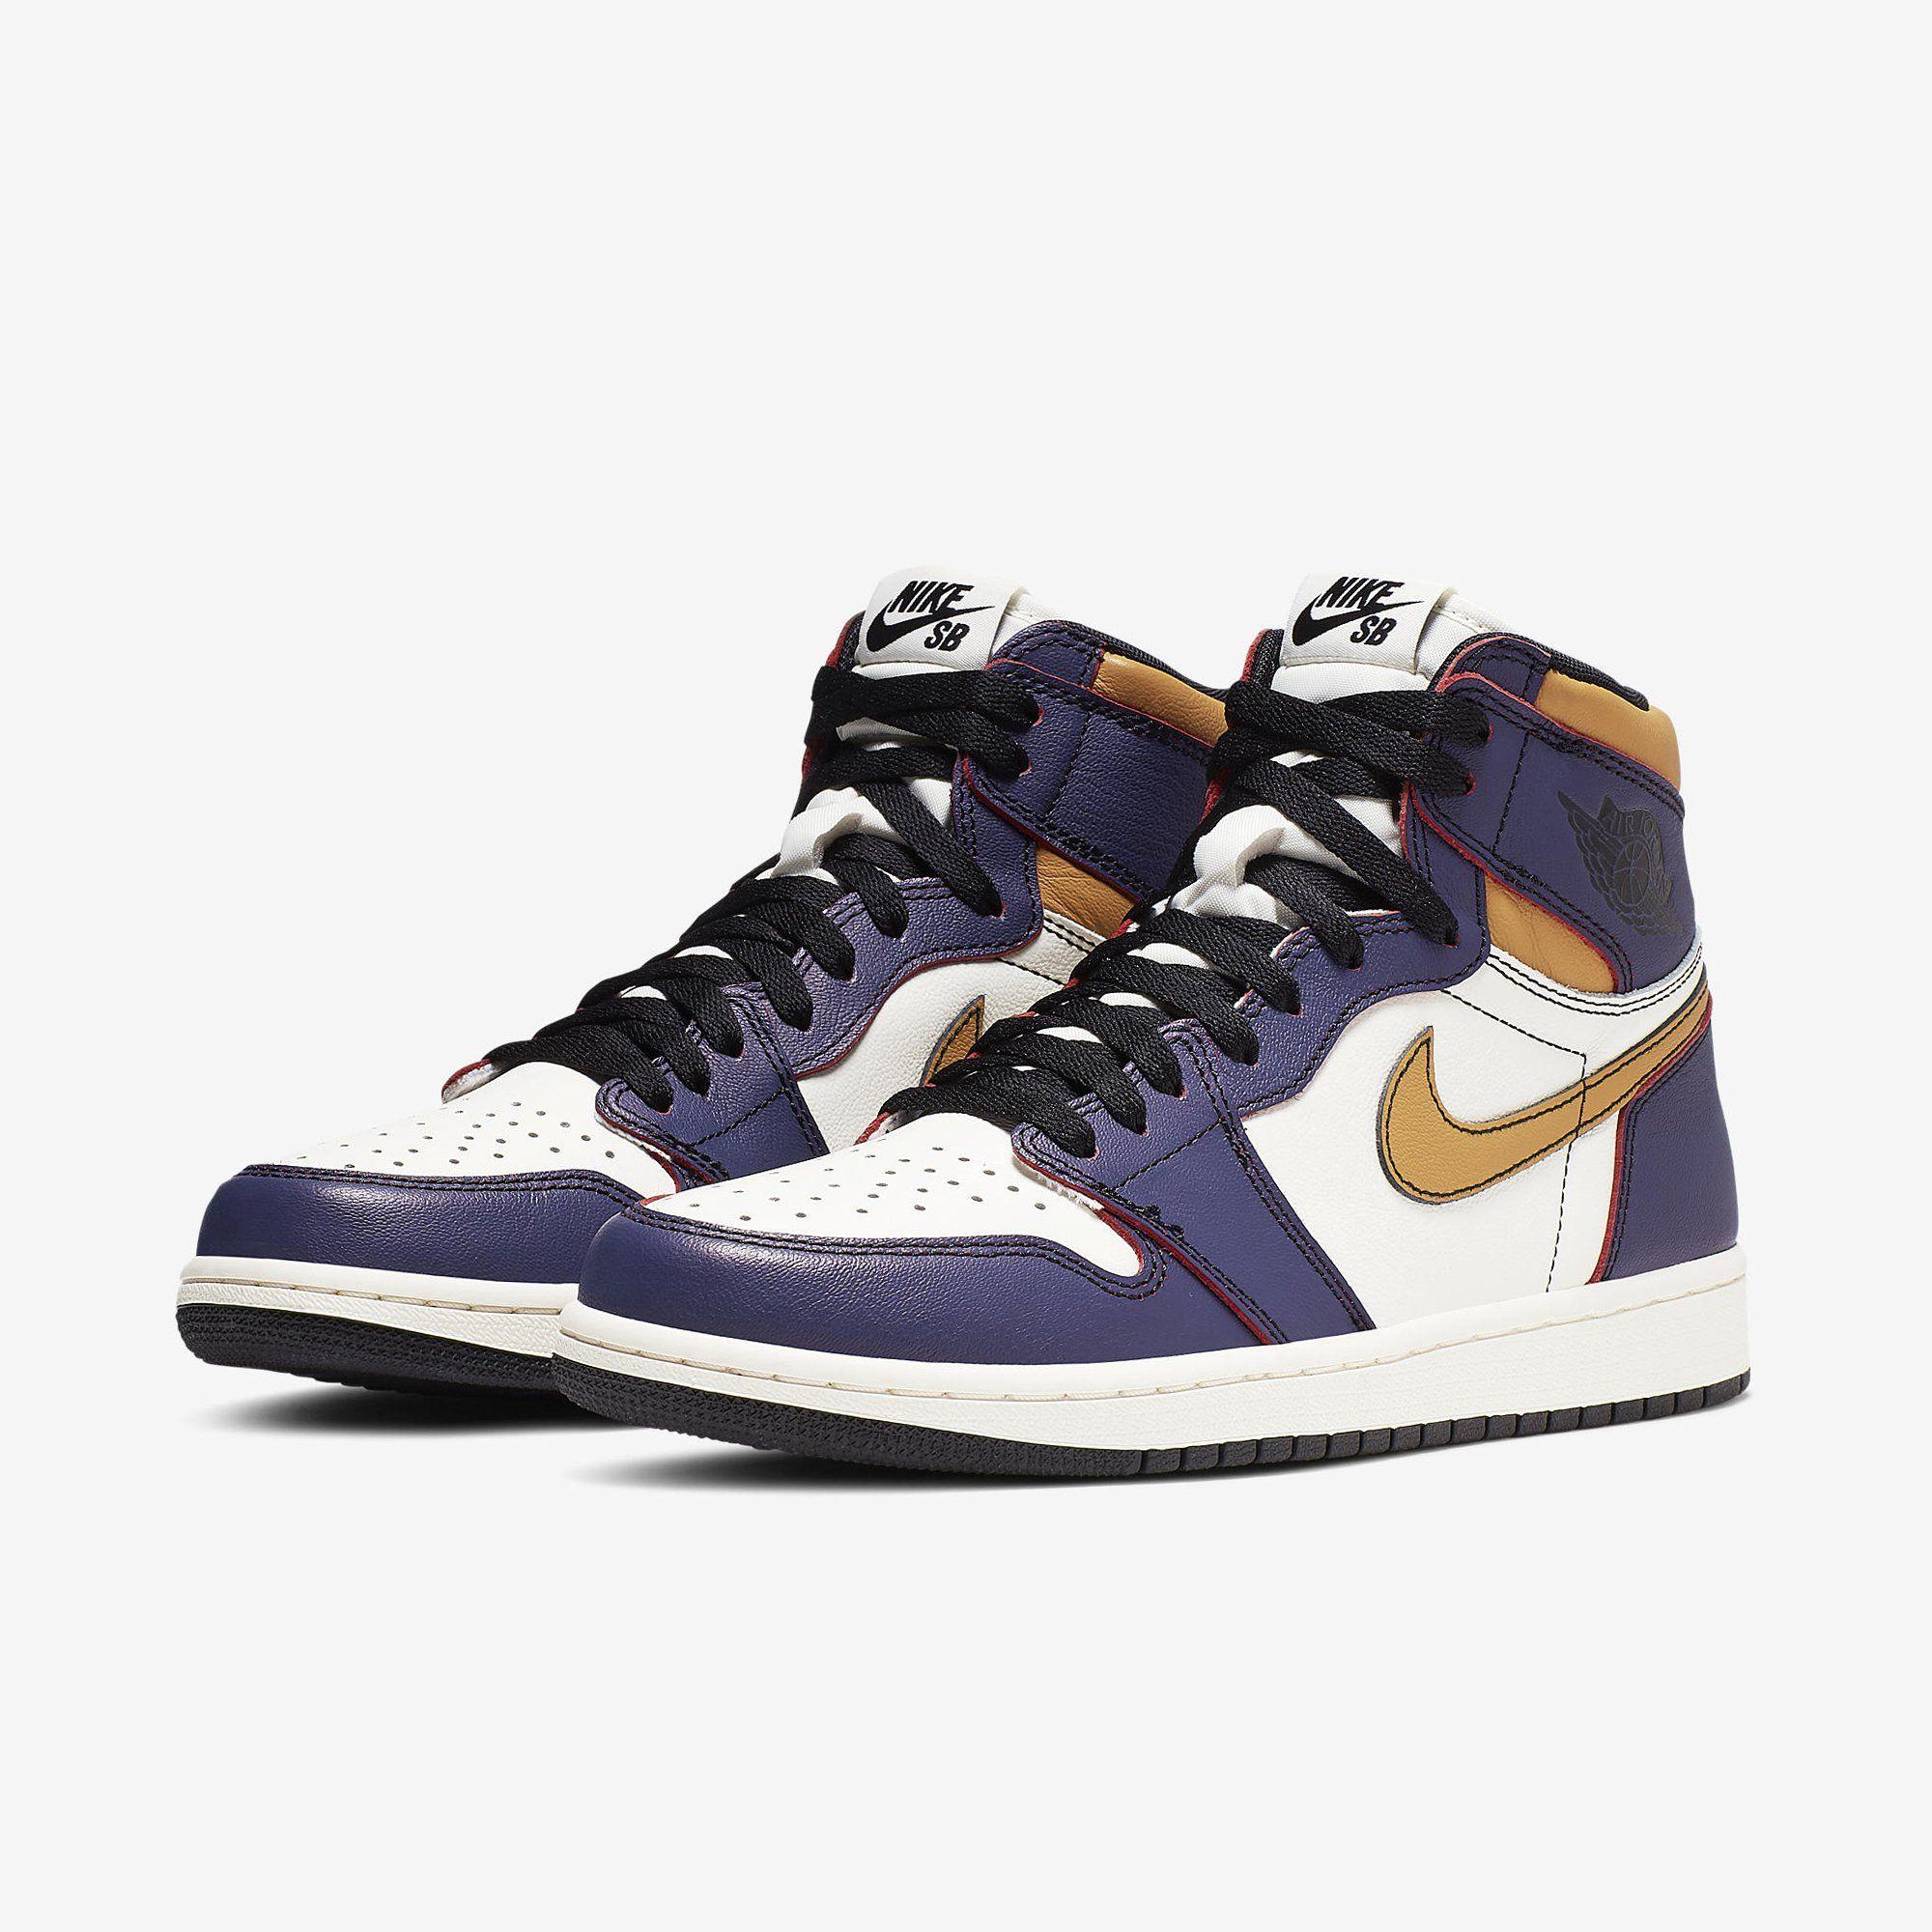 swoosh supply on Air jordans, Air jordans retro, Nike sb